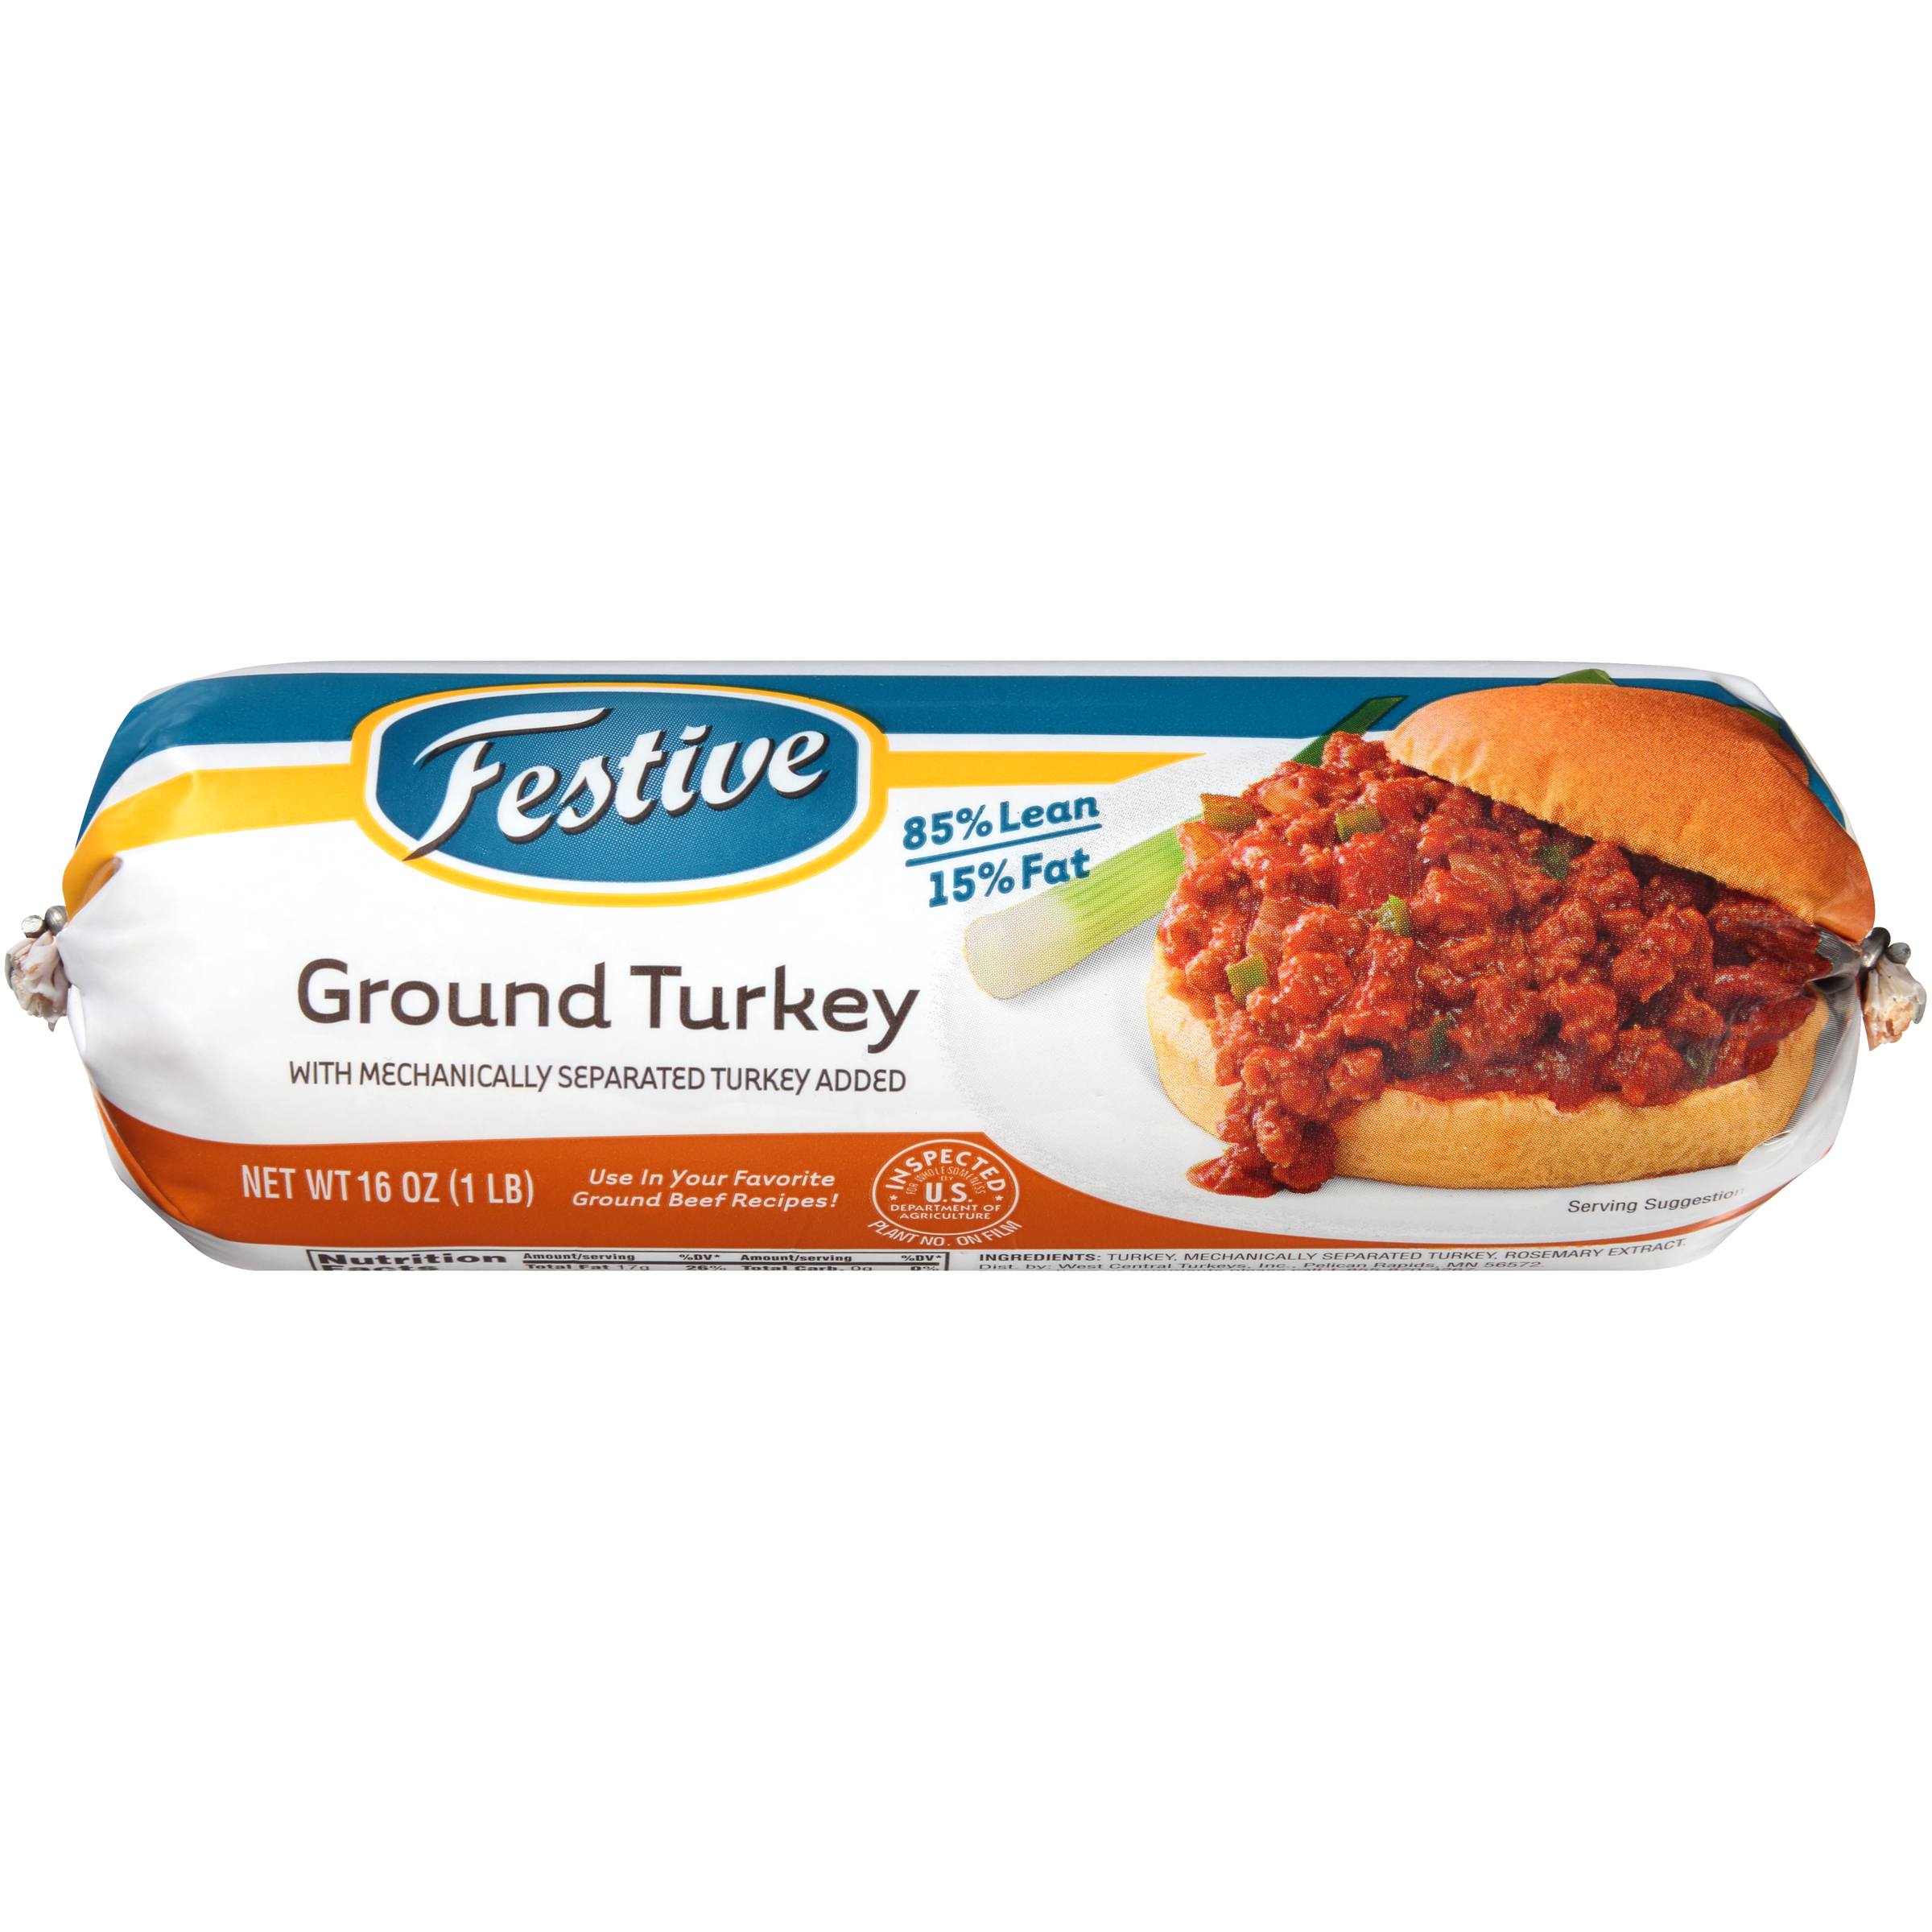 Festive Ground Turkey Roll, Frozen 1.0 lbs